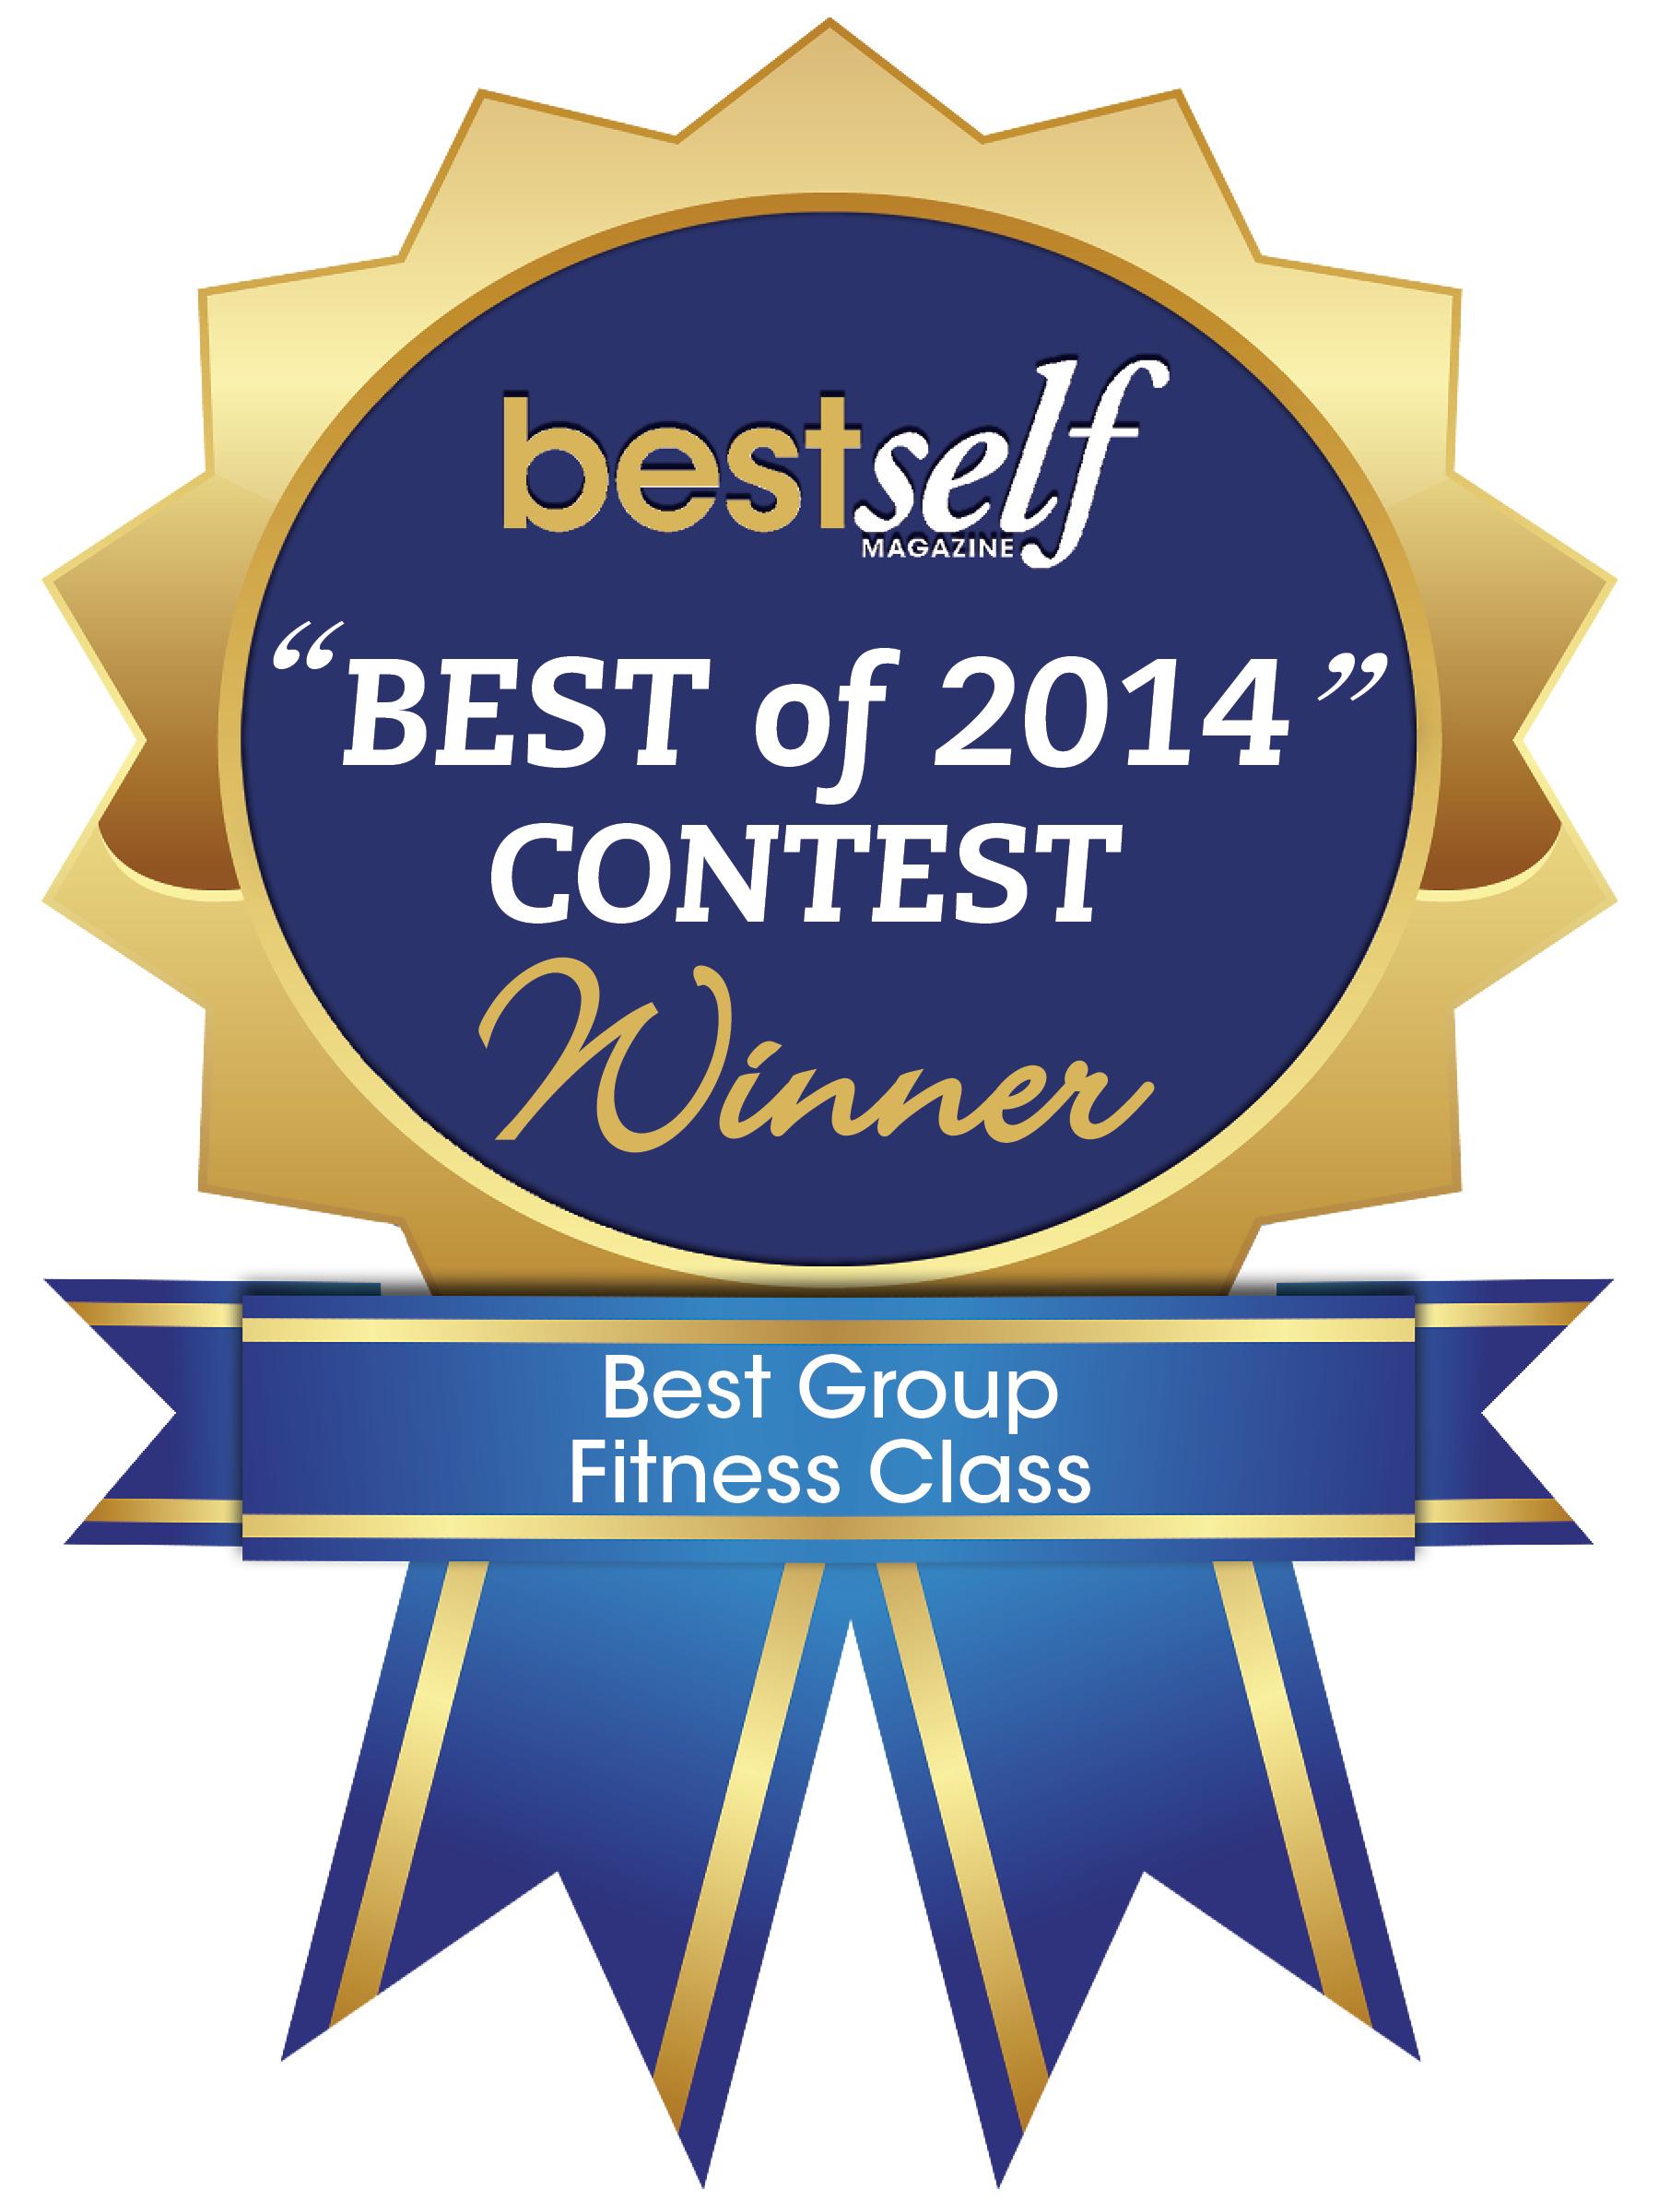 BestGroupFitnessClass